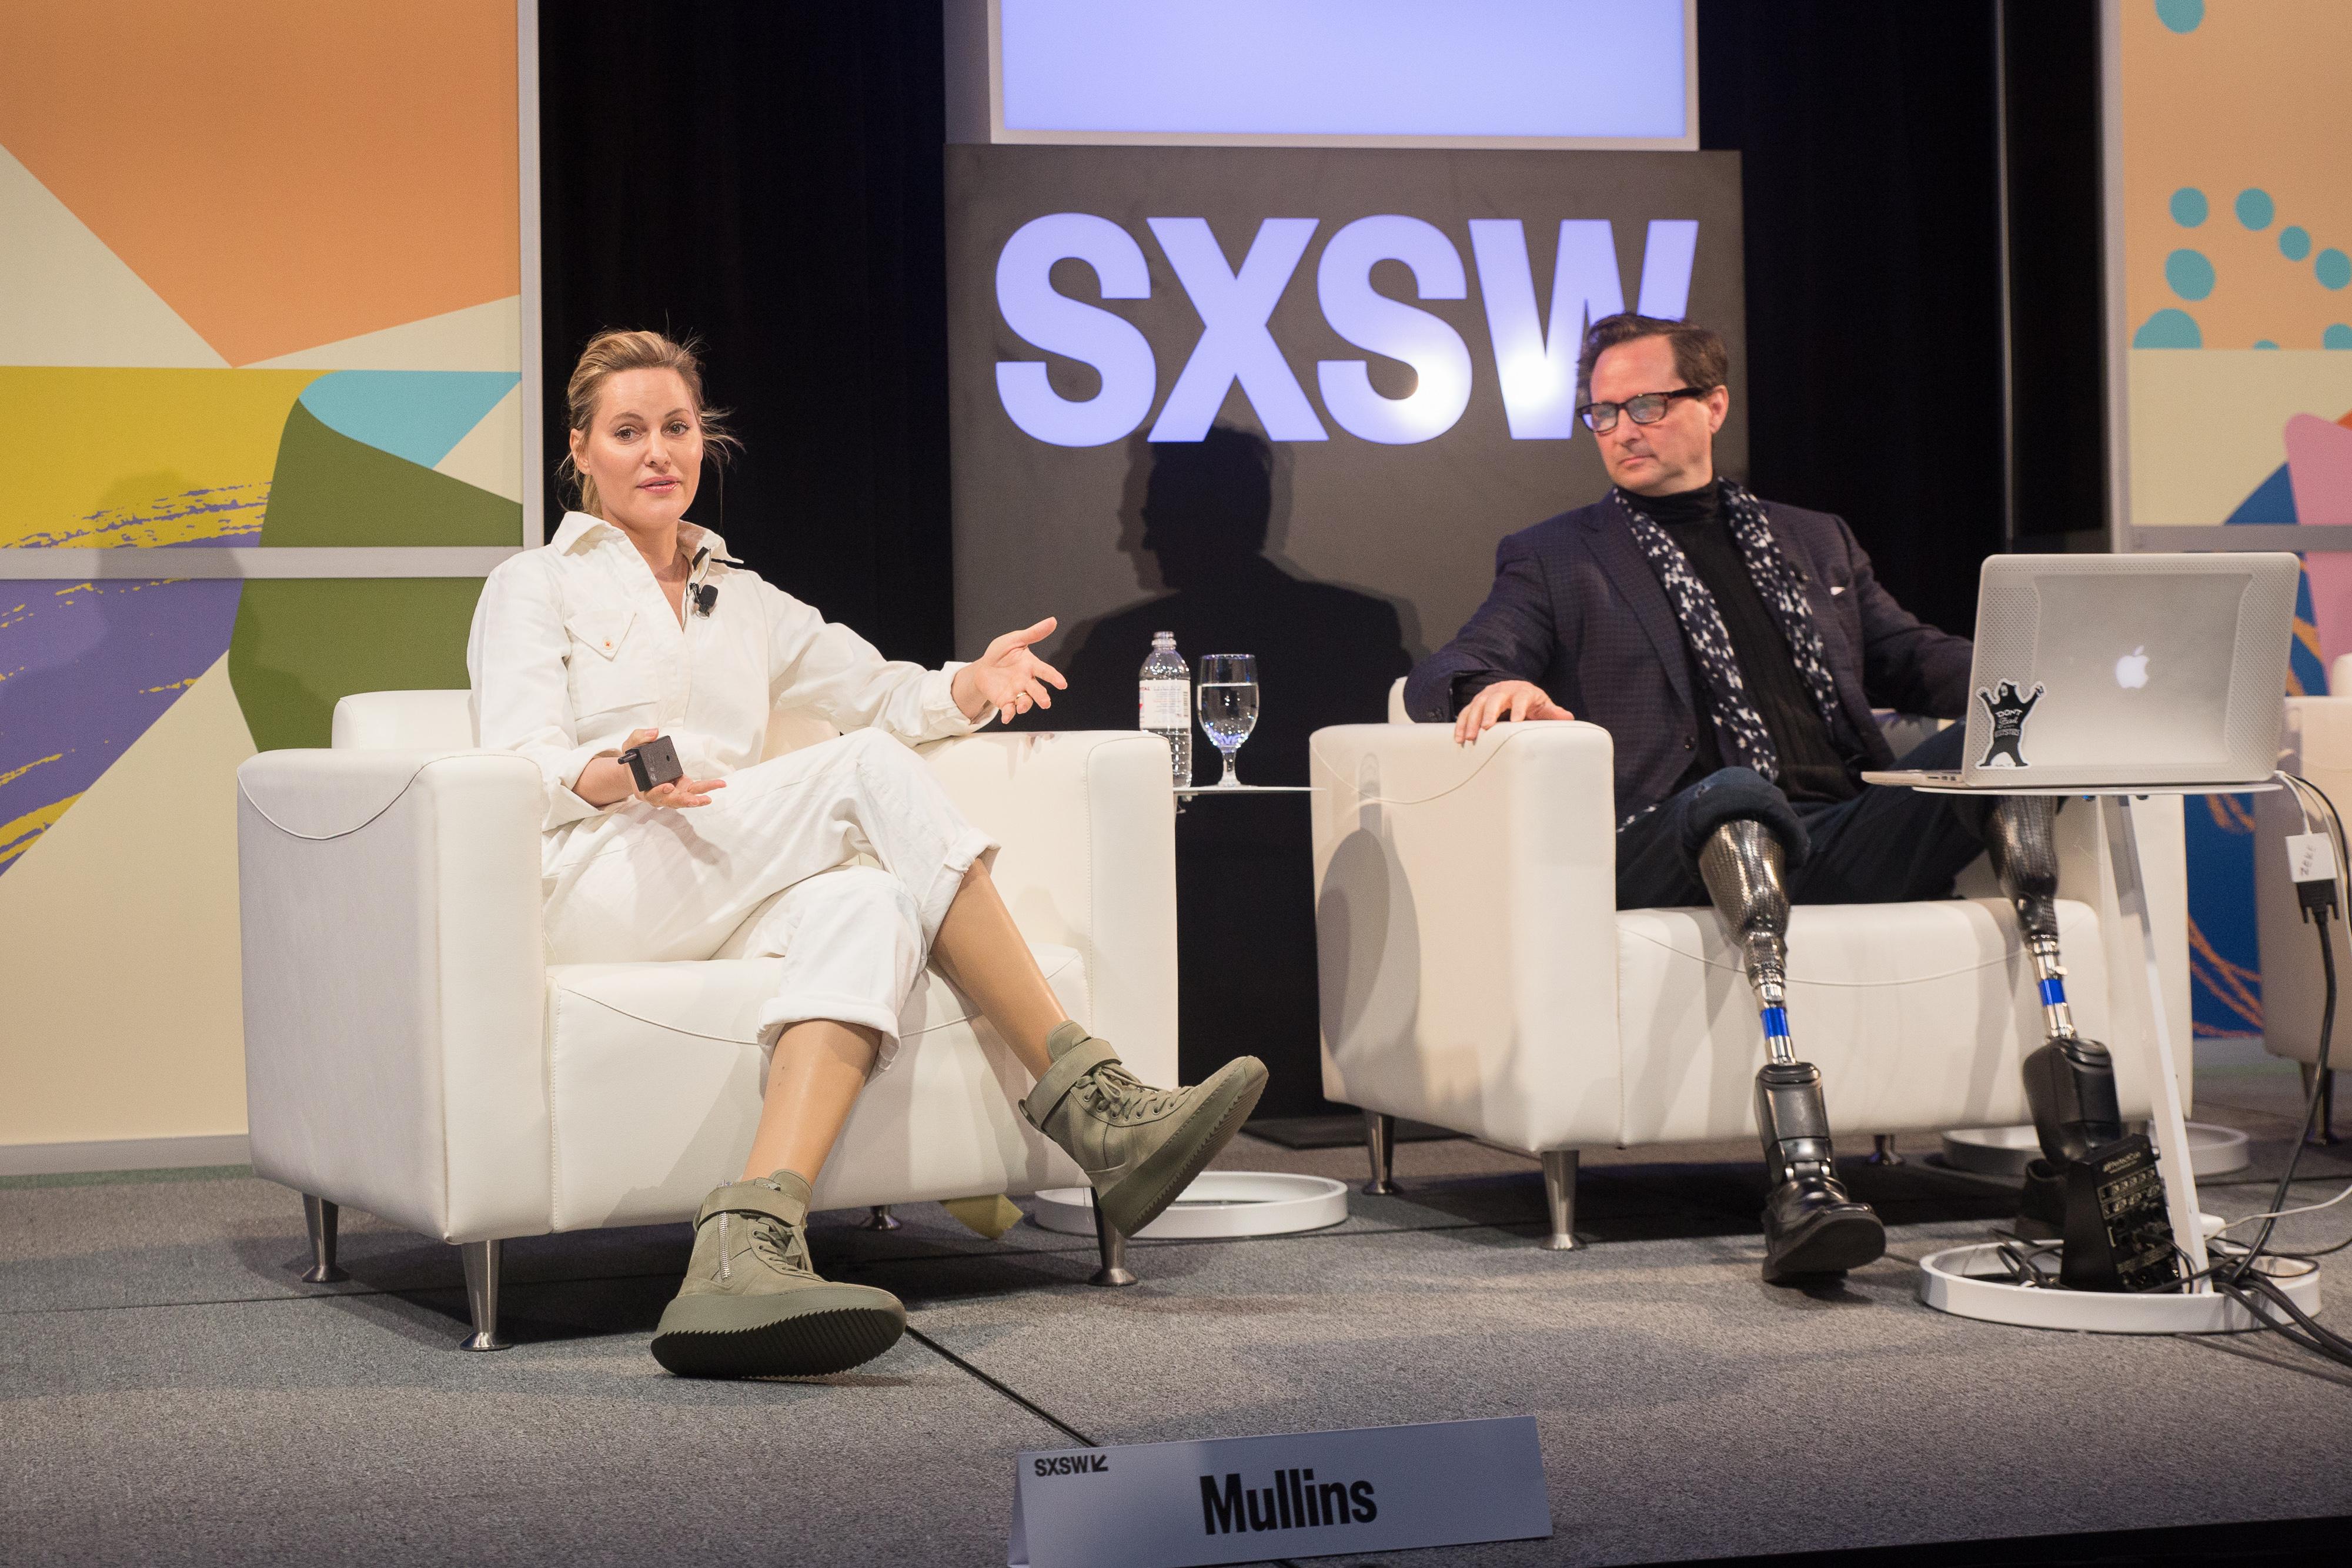 Aimee Mullins & Hugh Herr | Photo by Michael Caufield